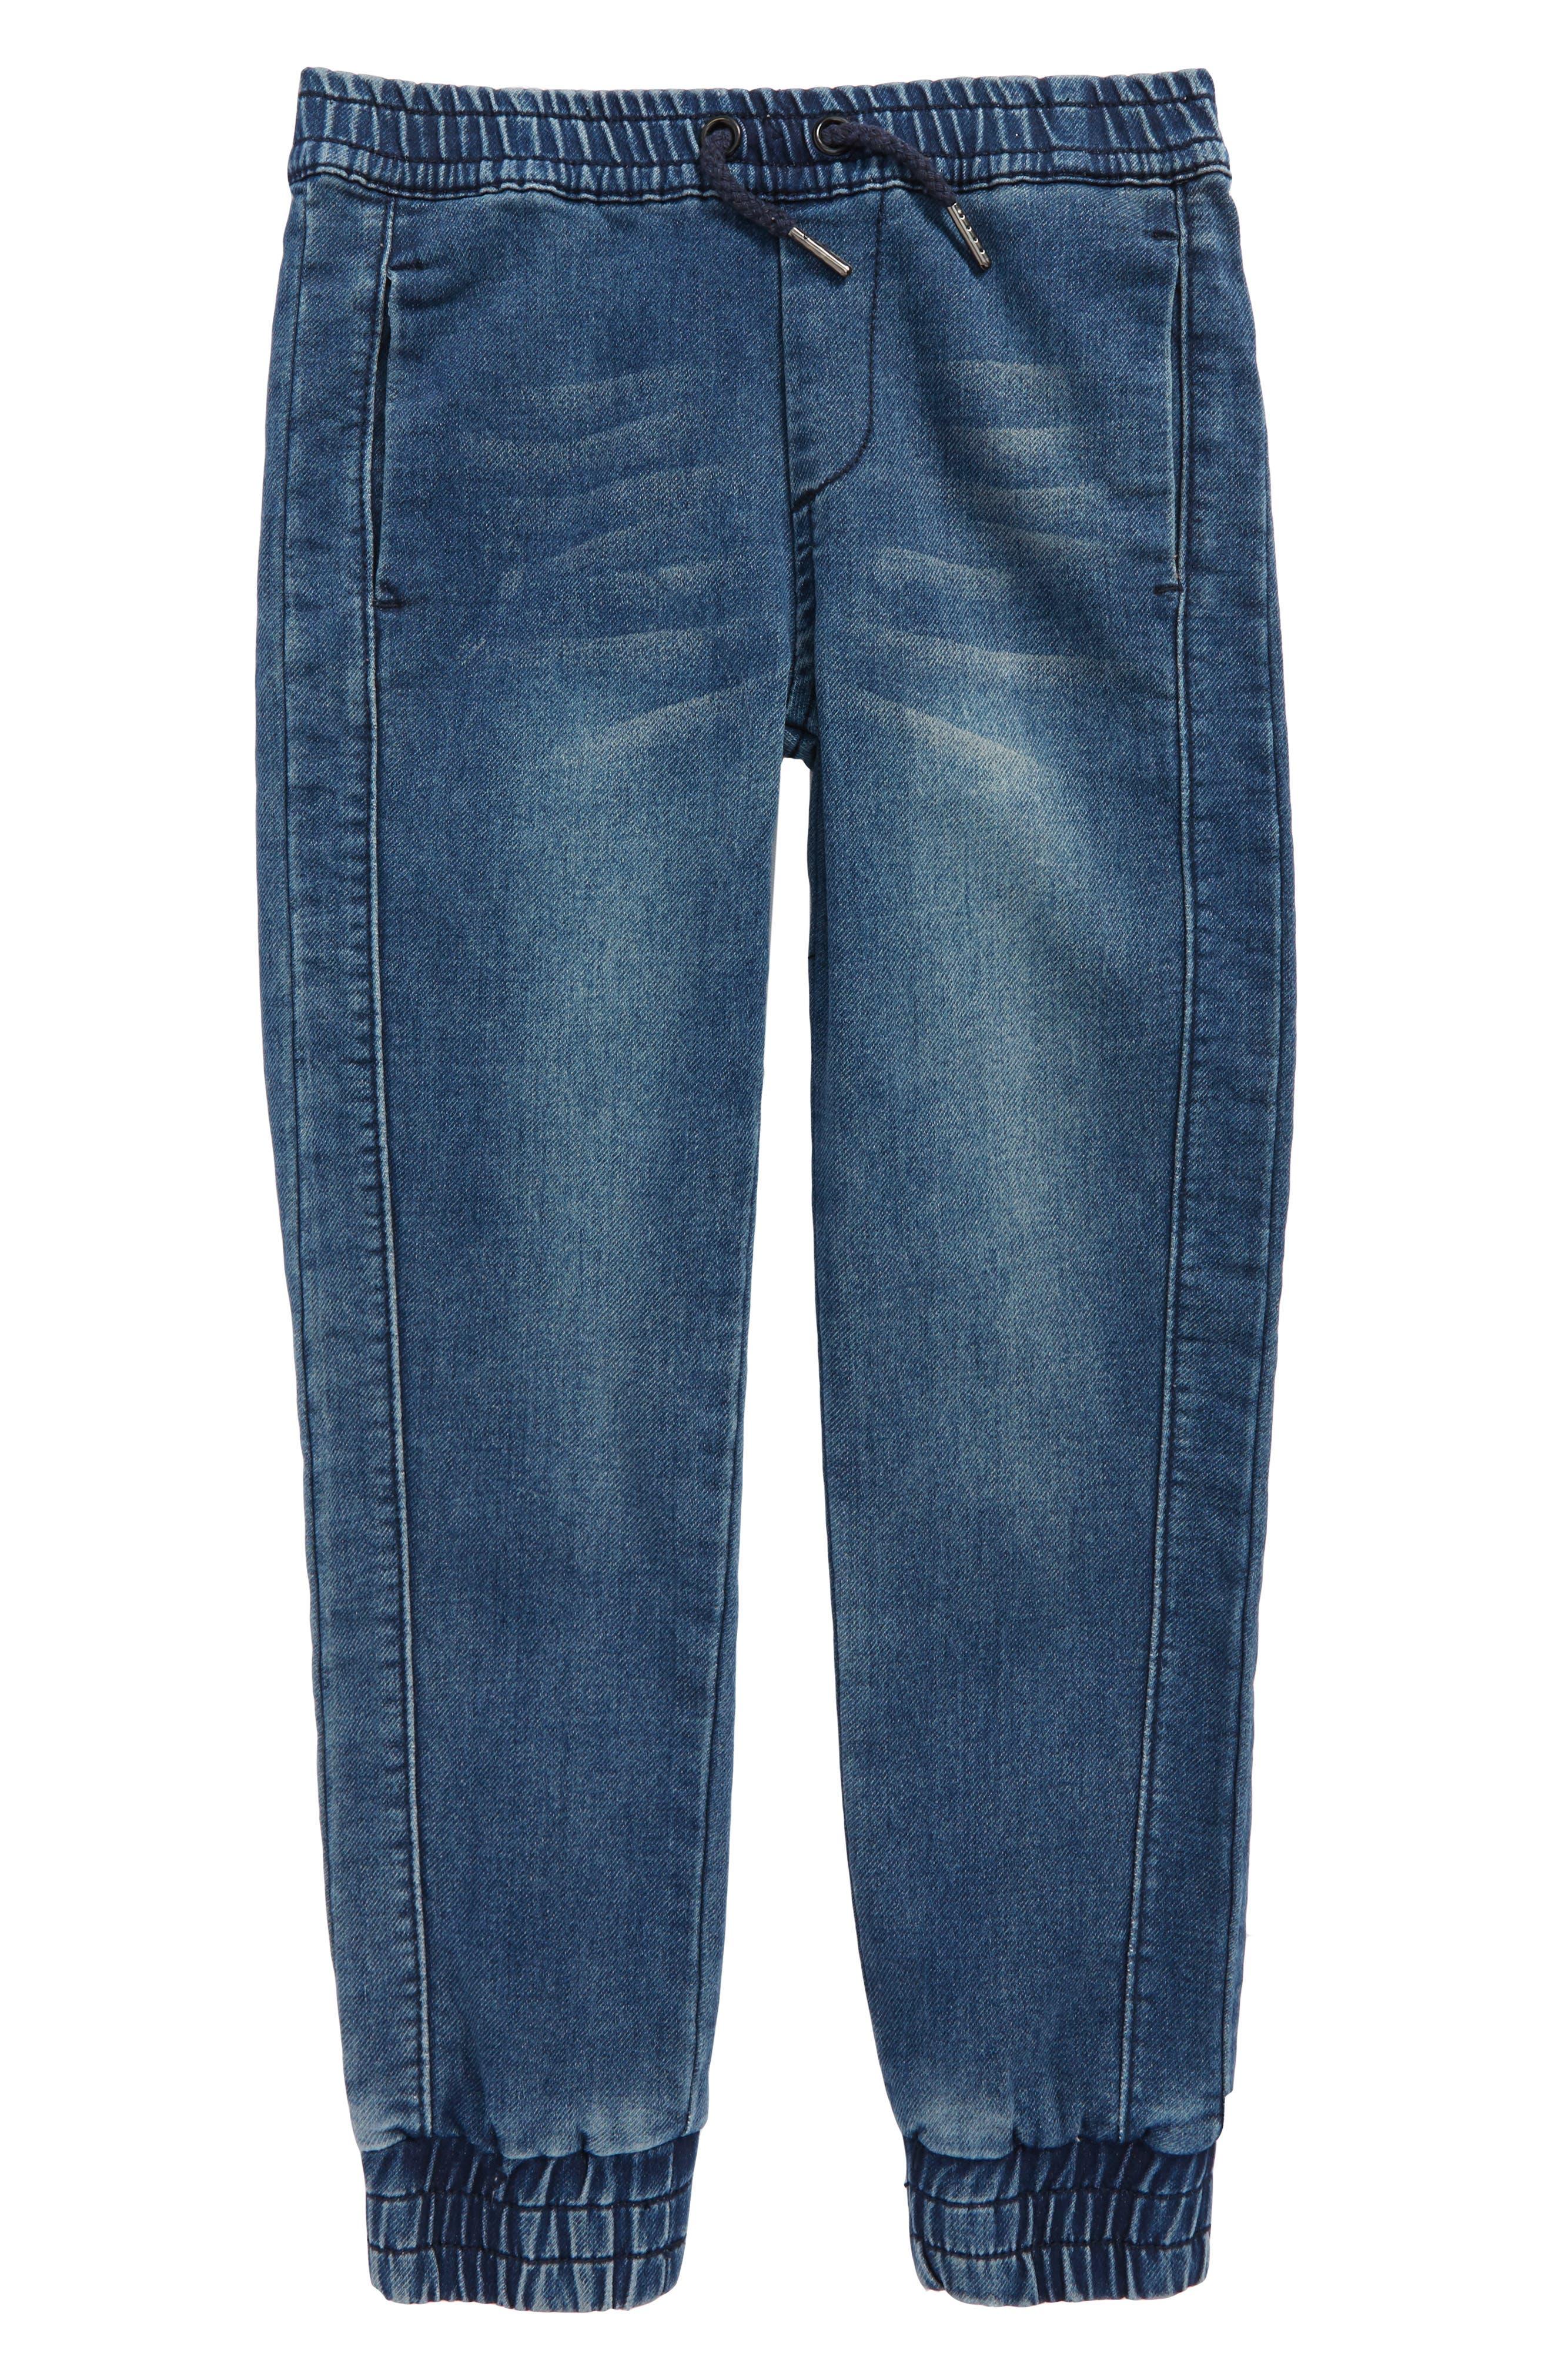 Slim Fit Denim Jogger Pants,                             Main thumbnail 1, color,                             490